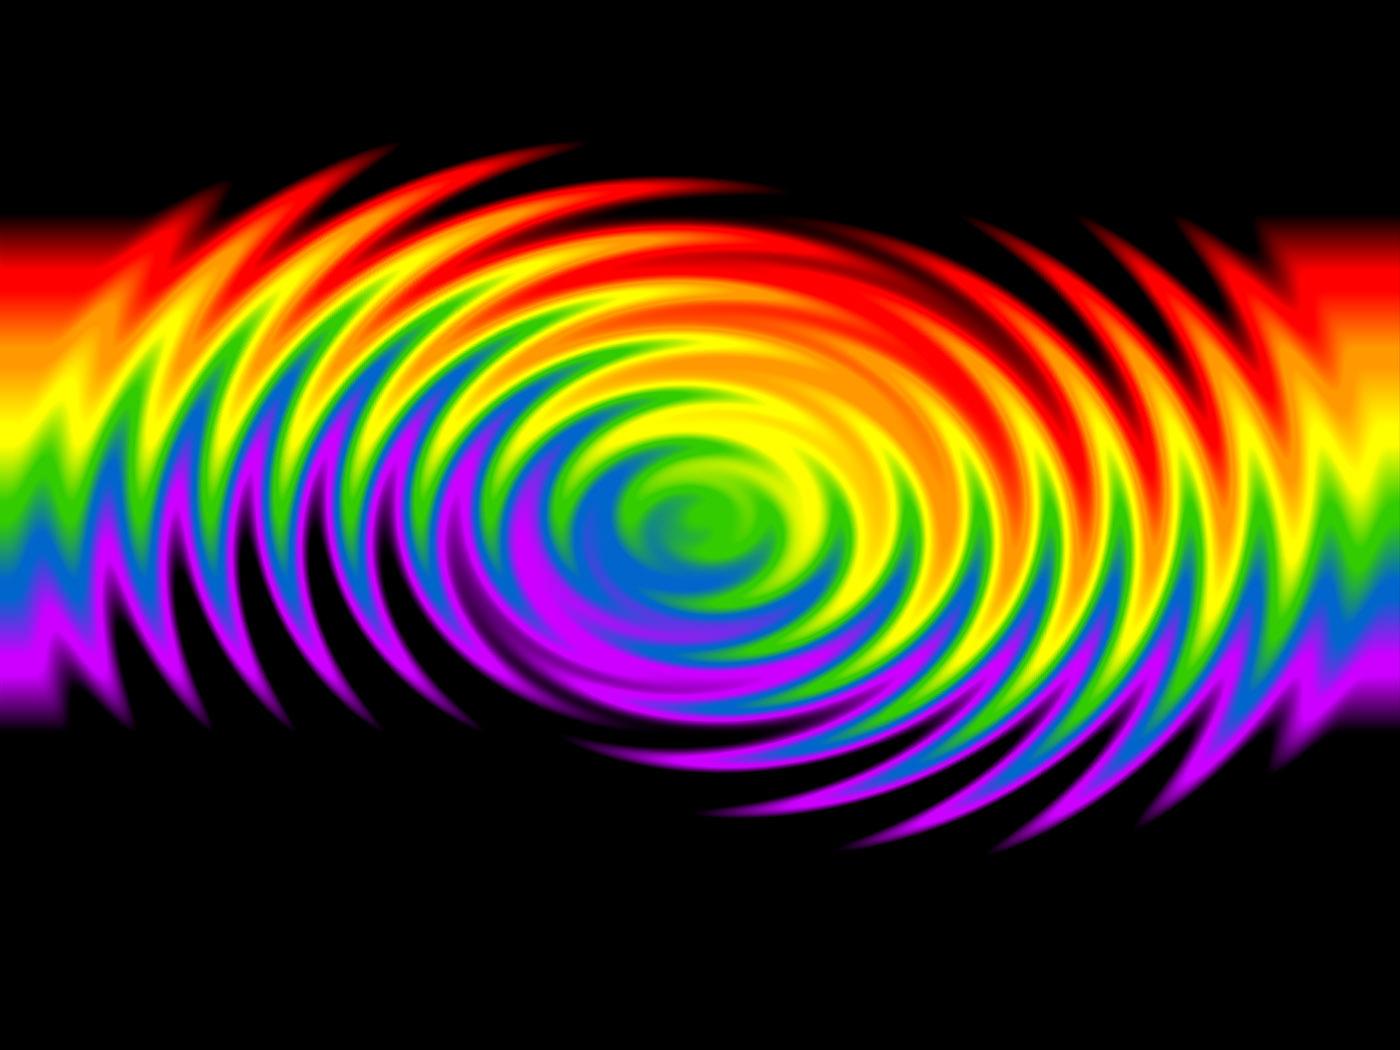 die farben des regenbogens kostenlose bilder. Black Bedroom Furniture Sets. Home Design Ideas